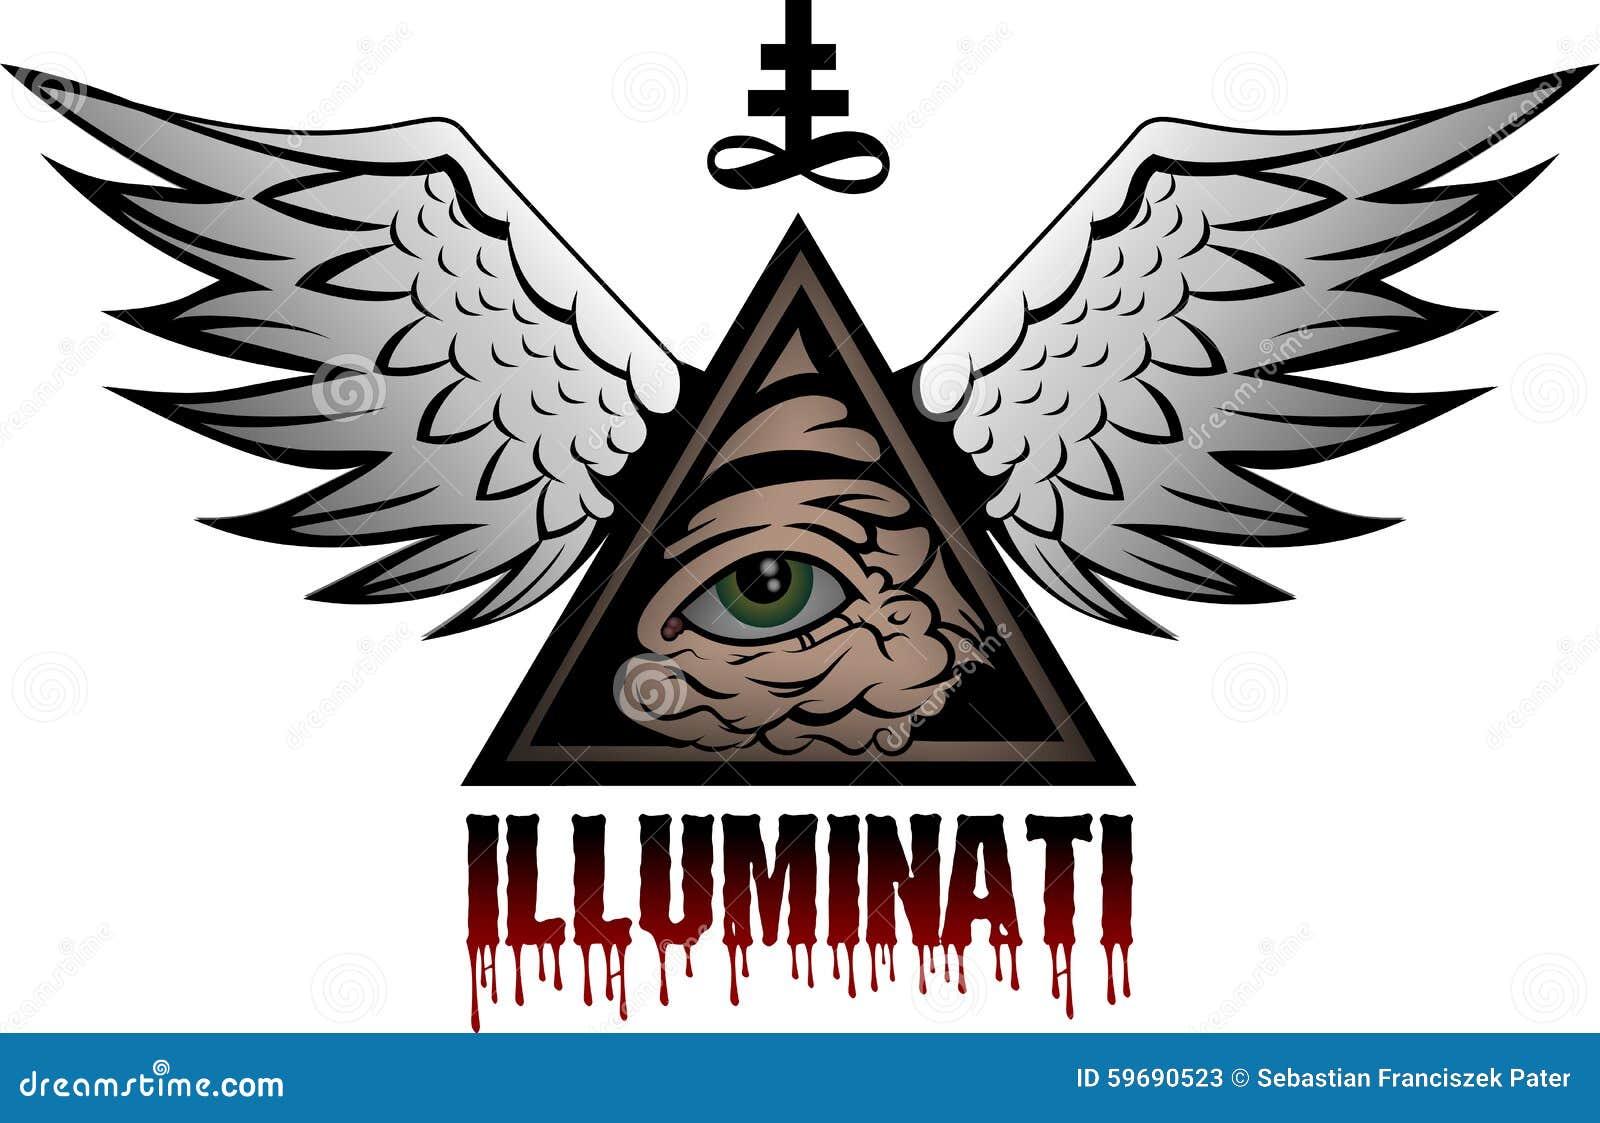 Illuminati pics symbols gallery symbol and sign ideas illuminati stock image image of lucre bill closeup 59690523 illuminati buycottarizona biocorpaavc